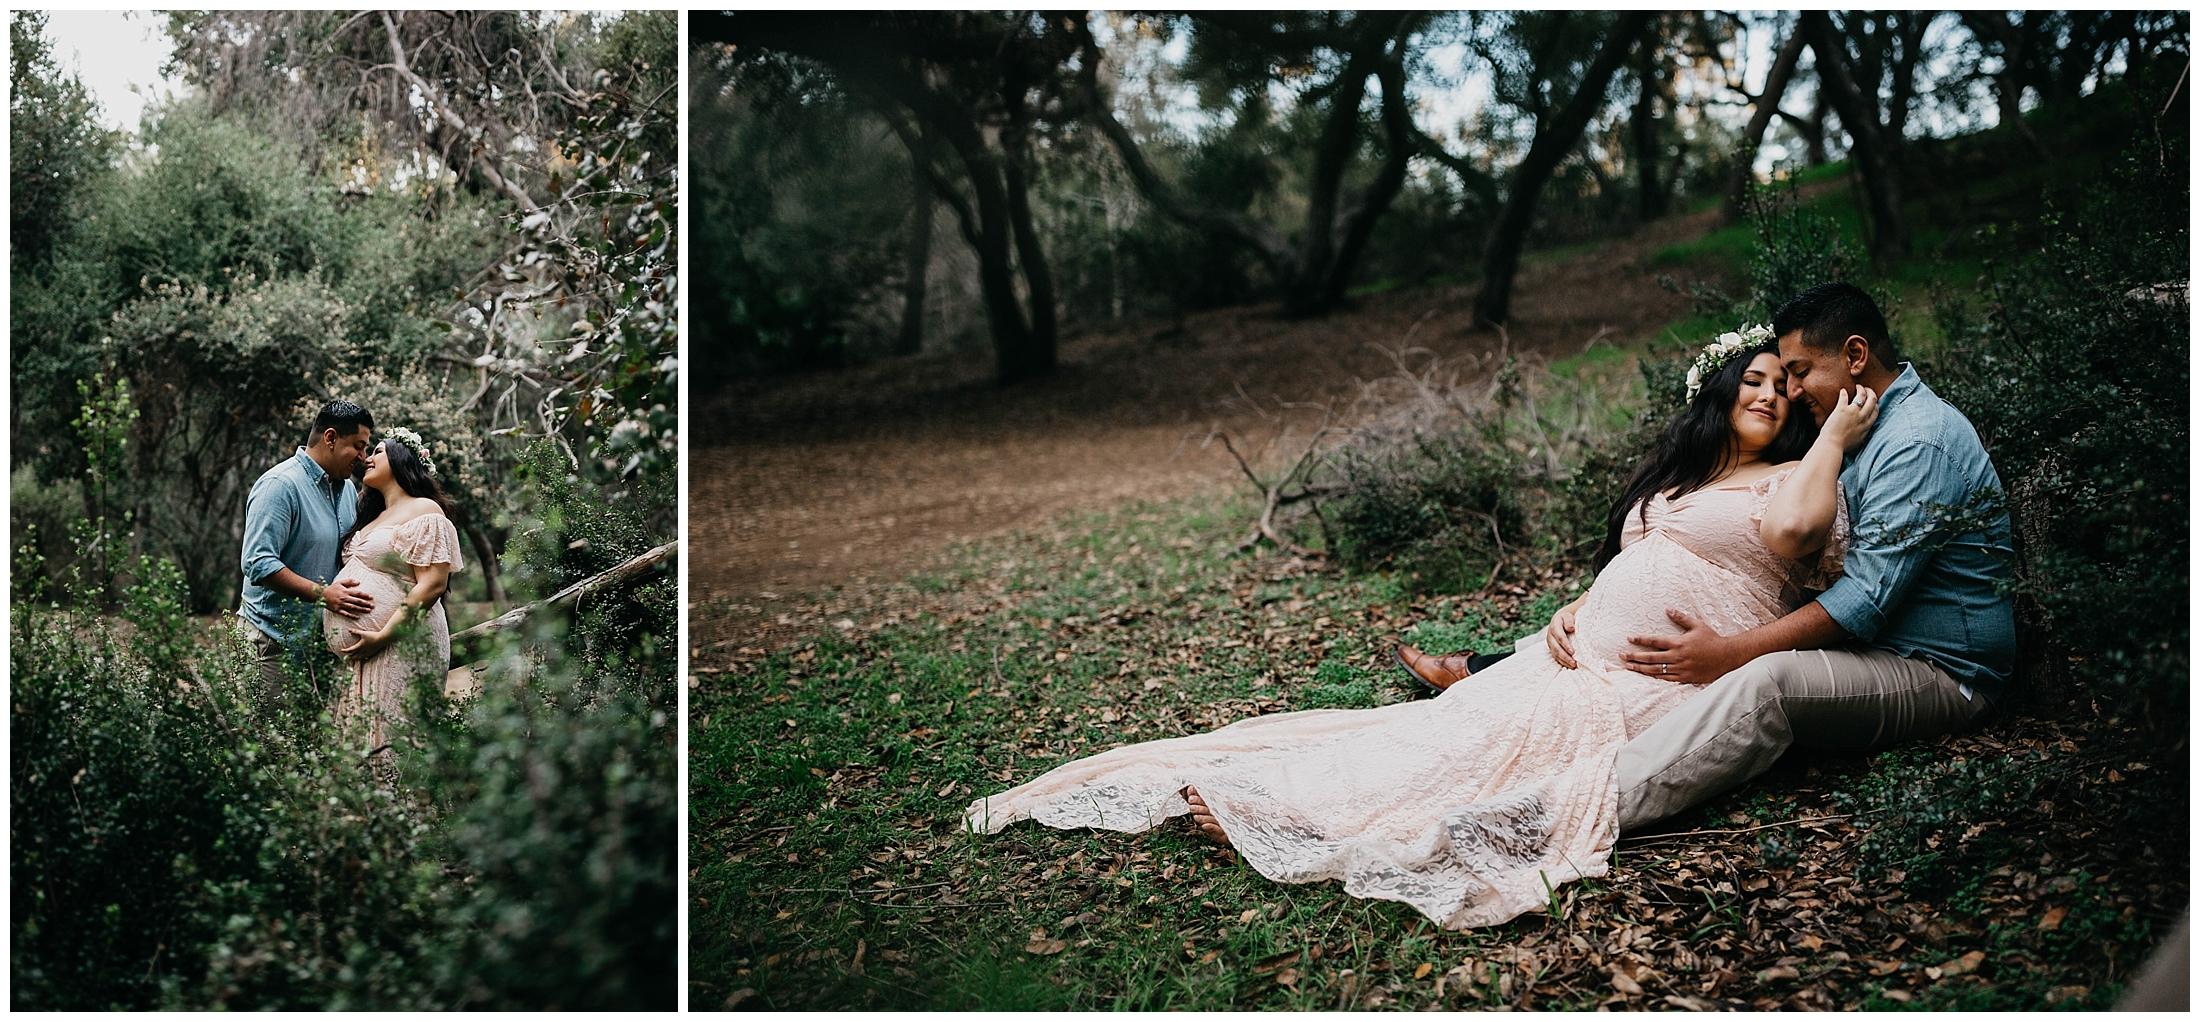 Fairytale Maternity by Lomonico Photography